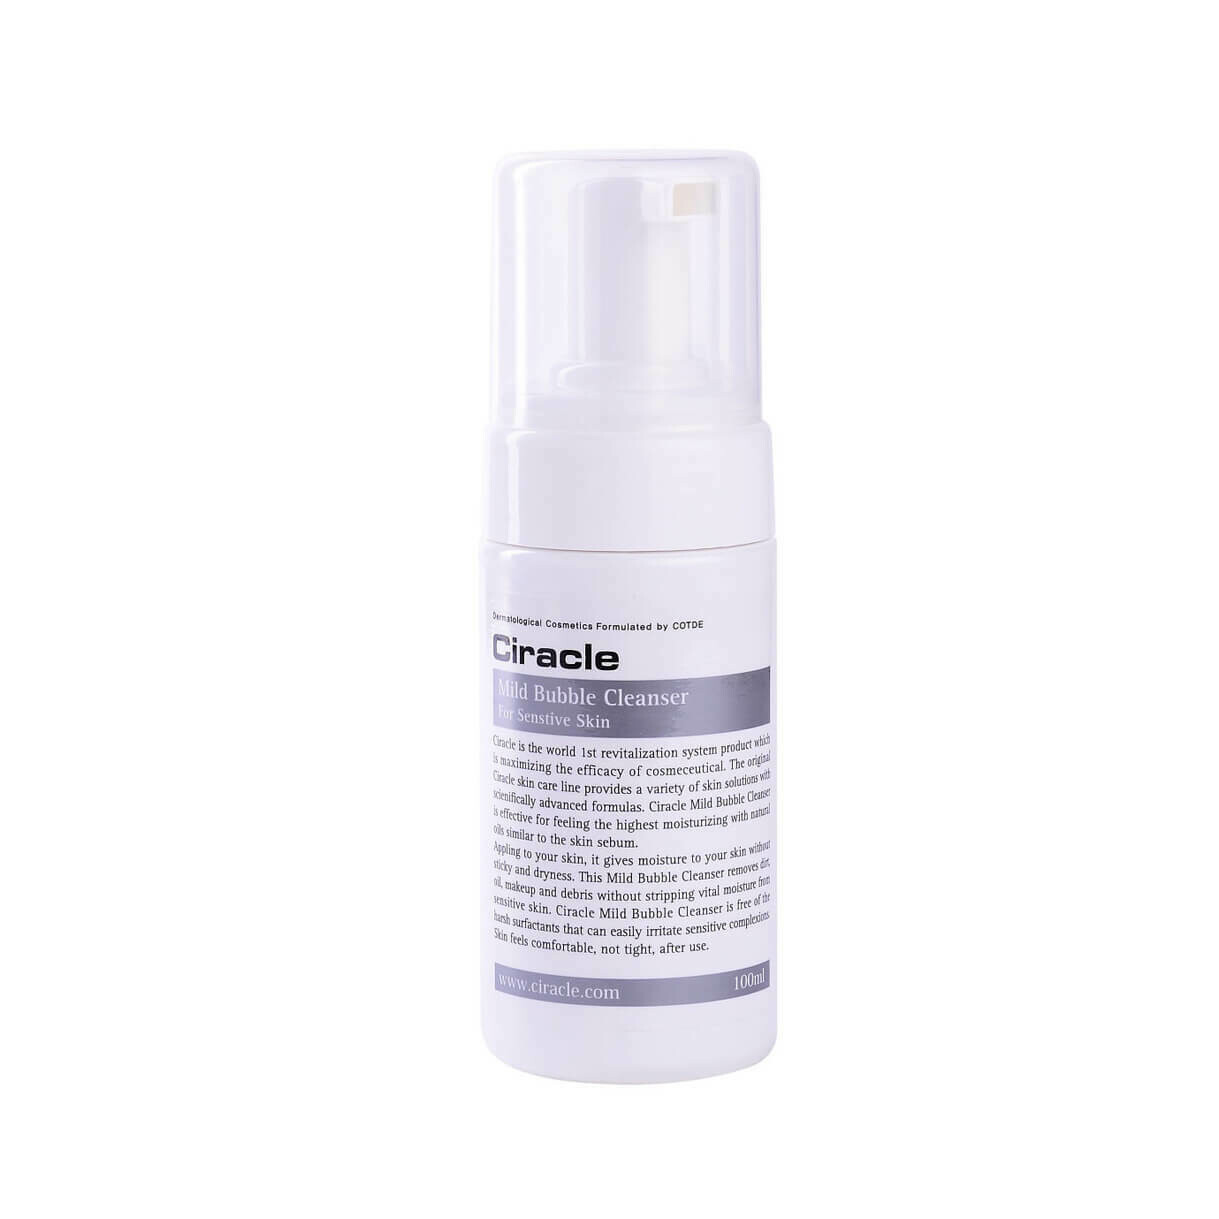 СР Cleansing Пенка для чувствительной кожи Ciracle Mild Bubble Cleanser 100мл